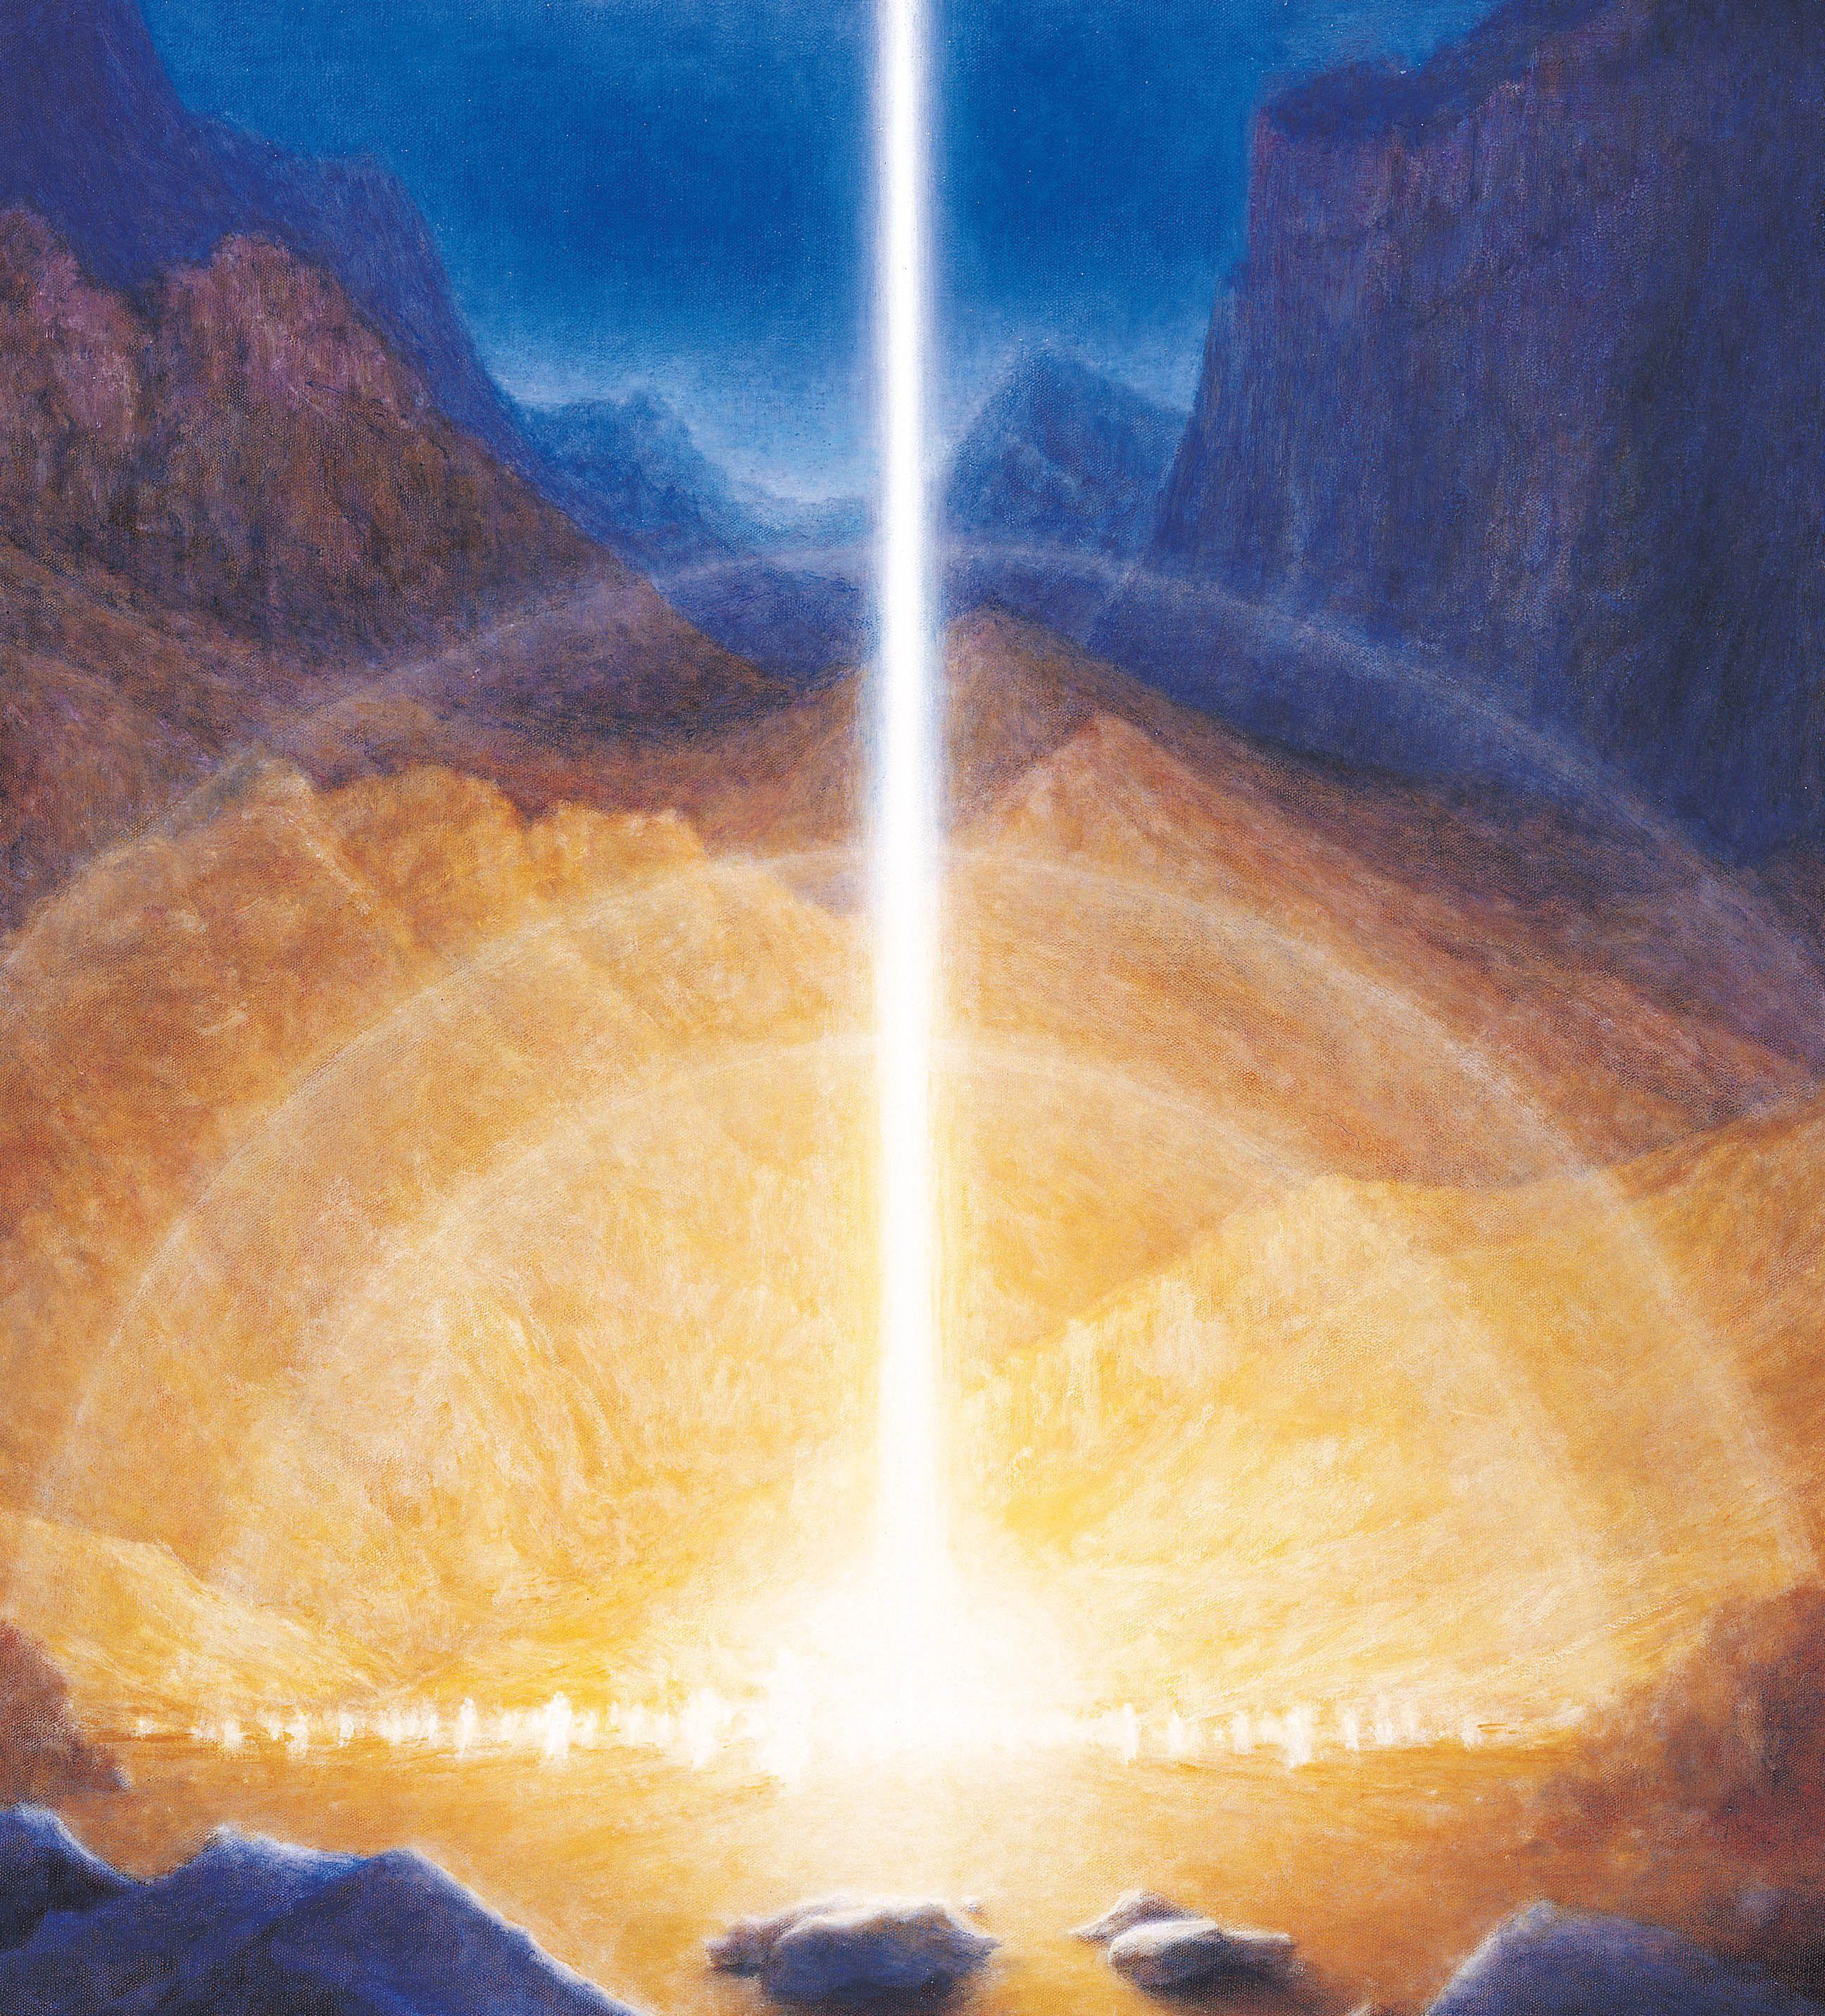 C-VILLE - Have You Had Spiritual Experiences? by Eckankar